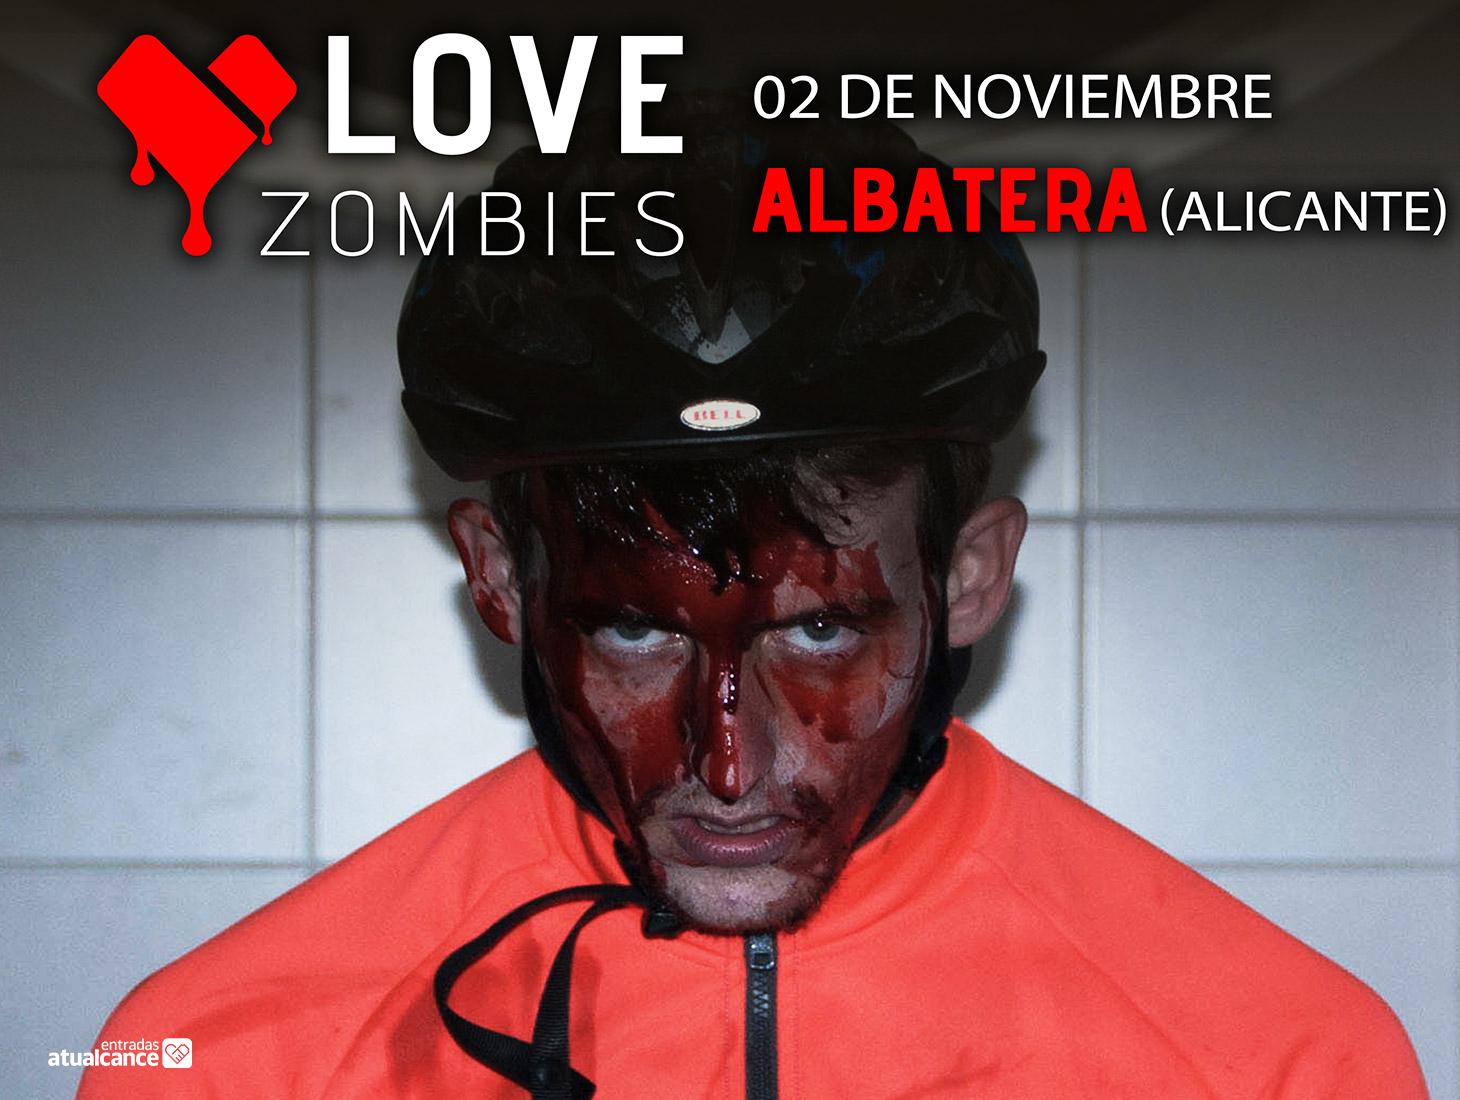 love-zombie-albatera-5d8207b628e93.jpeg